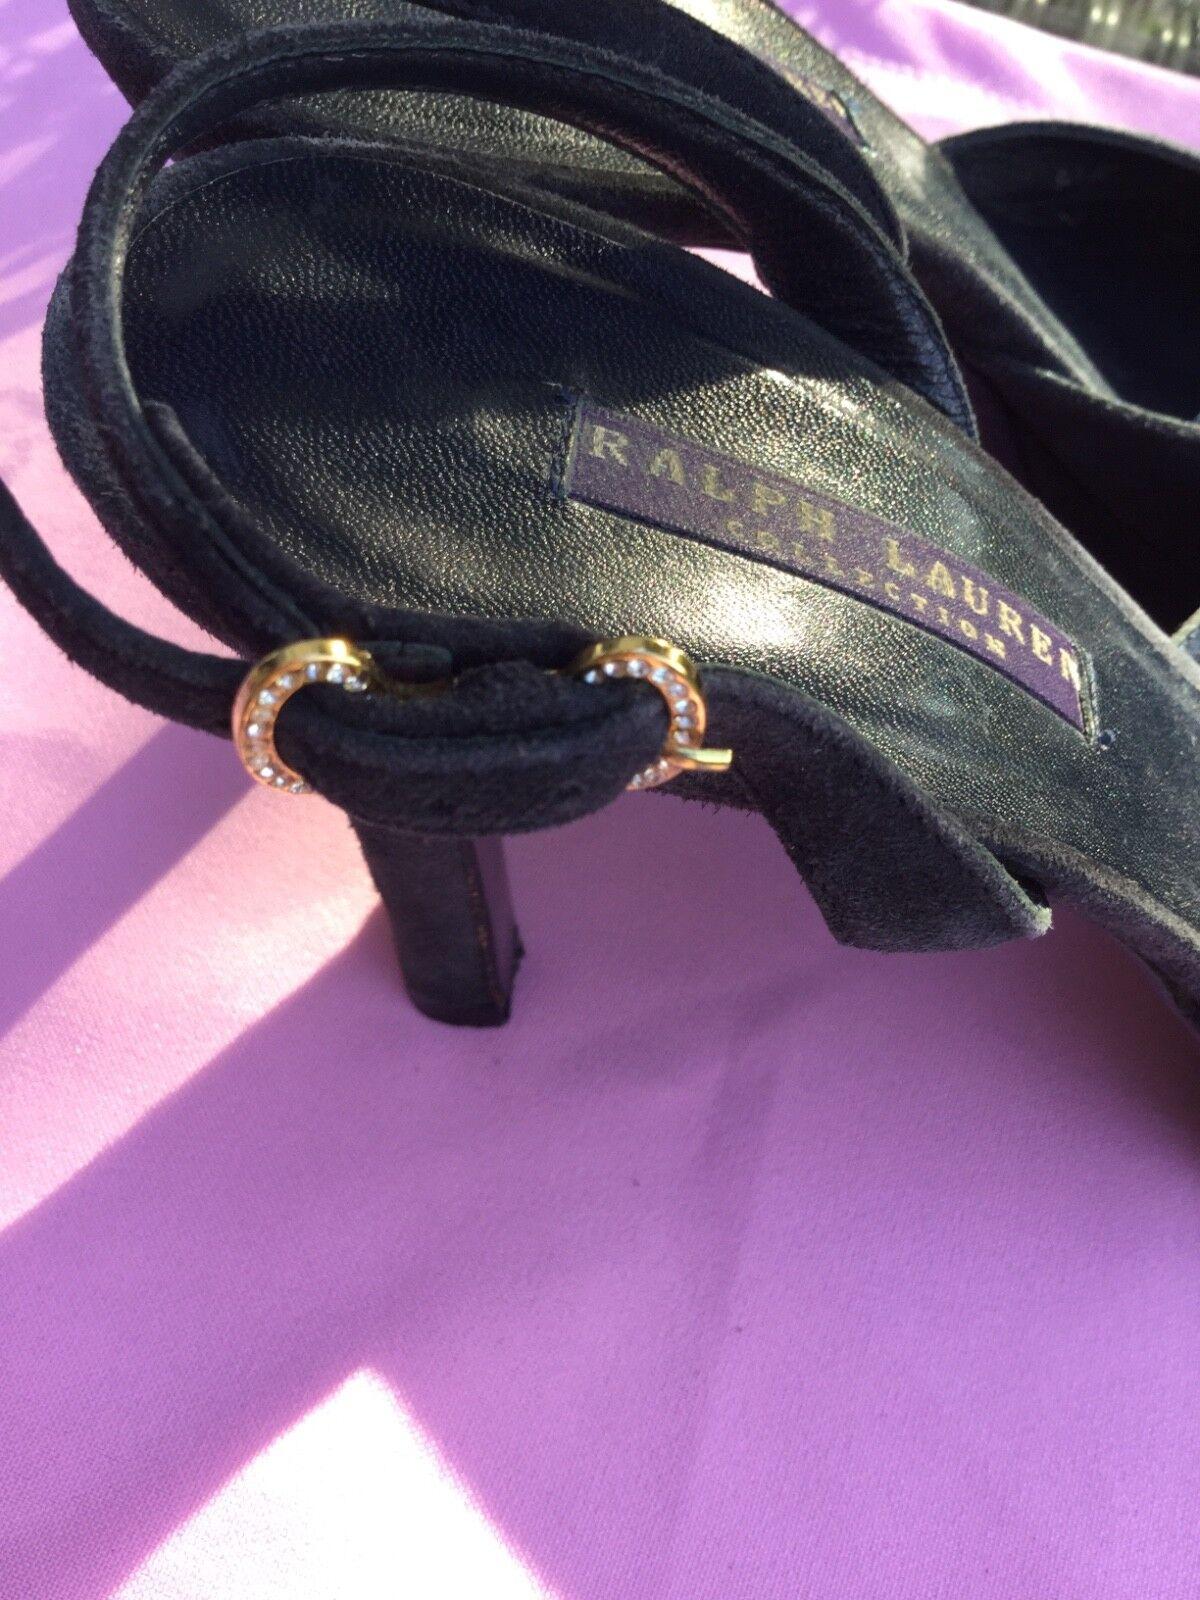 Ralph Lauren Pumps Slingpumps dunkelblaues Wildleder 39 39 39 ⚜️ f978fd